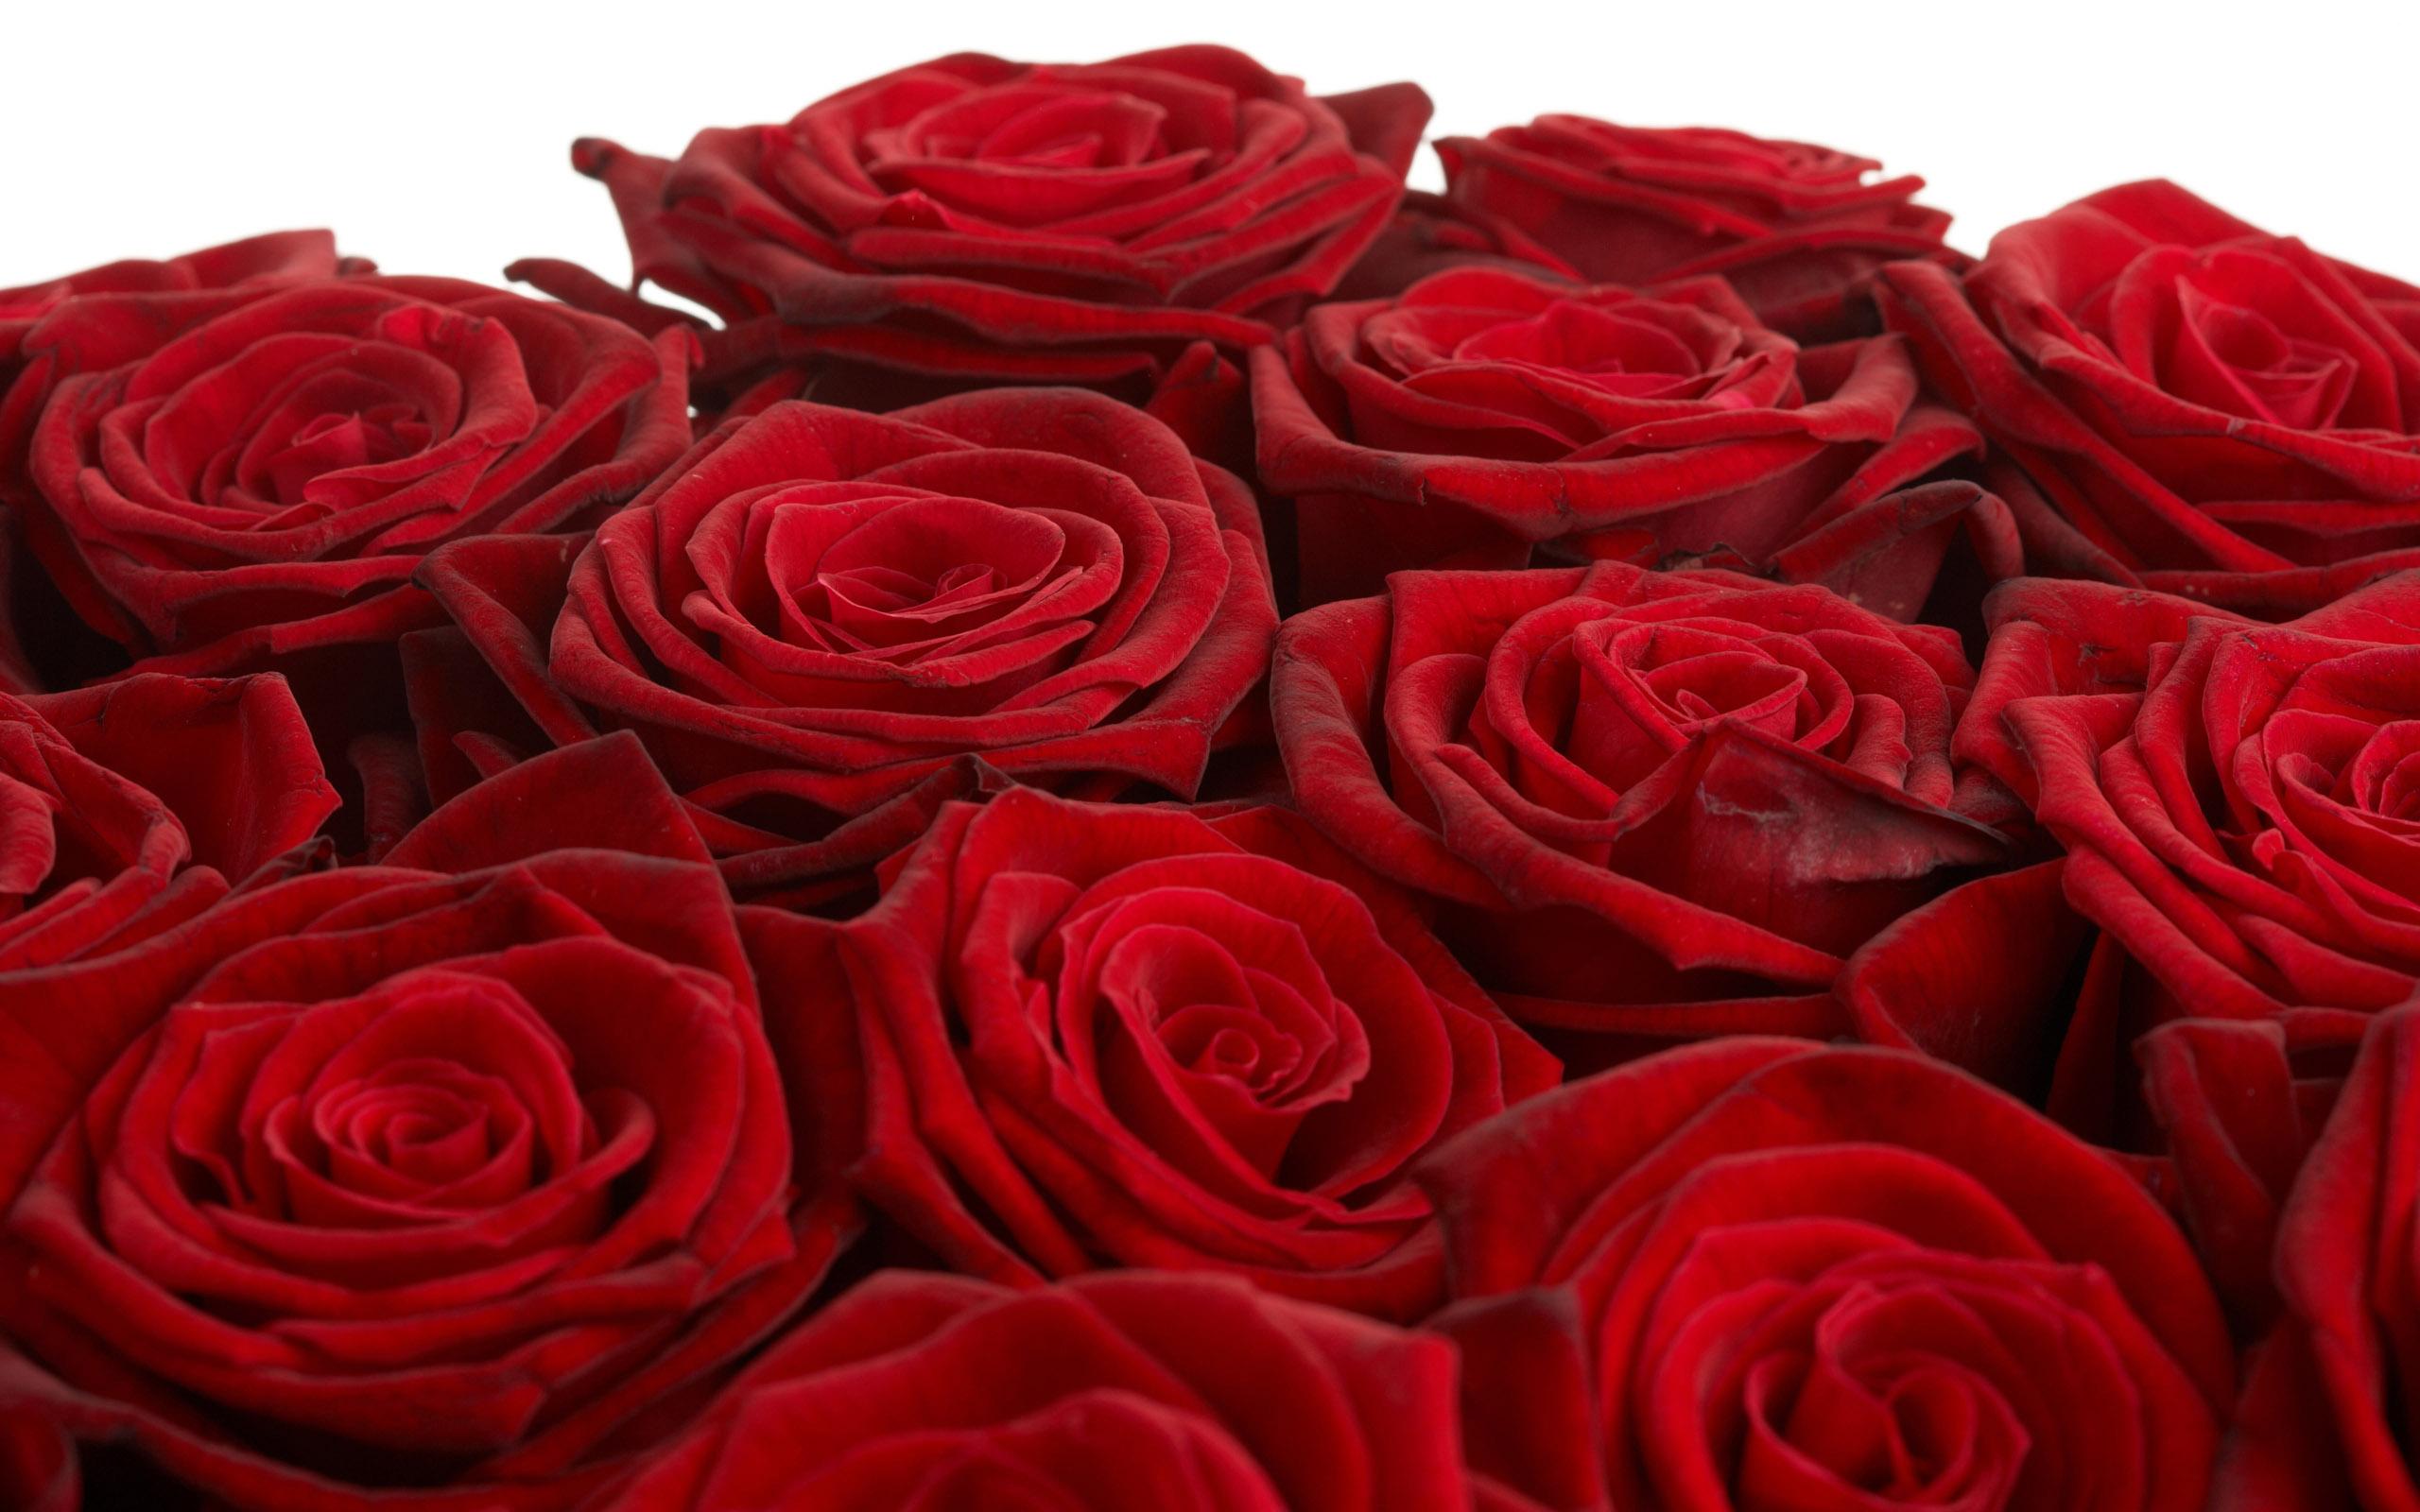 Beautiful Rose Flower Images Photo - Beautiful Rose Flower Wallpaper Download - HD Wallpaper